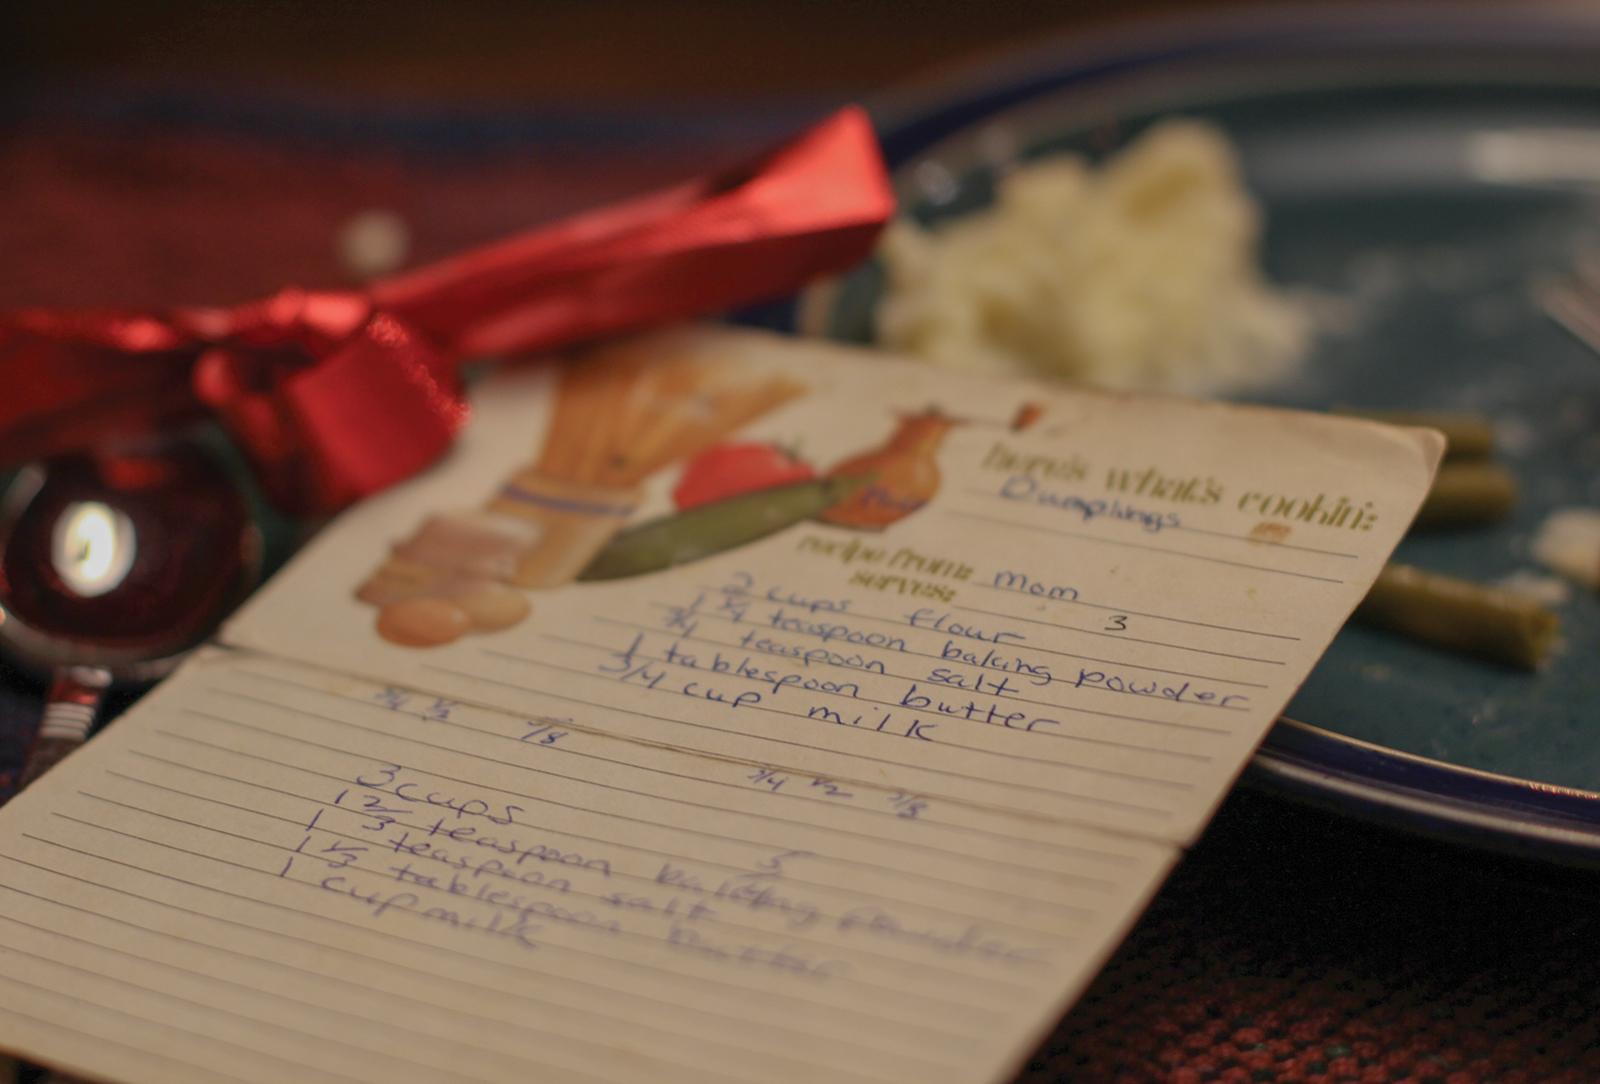 Karin-the-recipe-beef-and-dumplings-highlands-nc